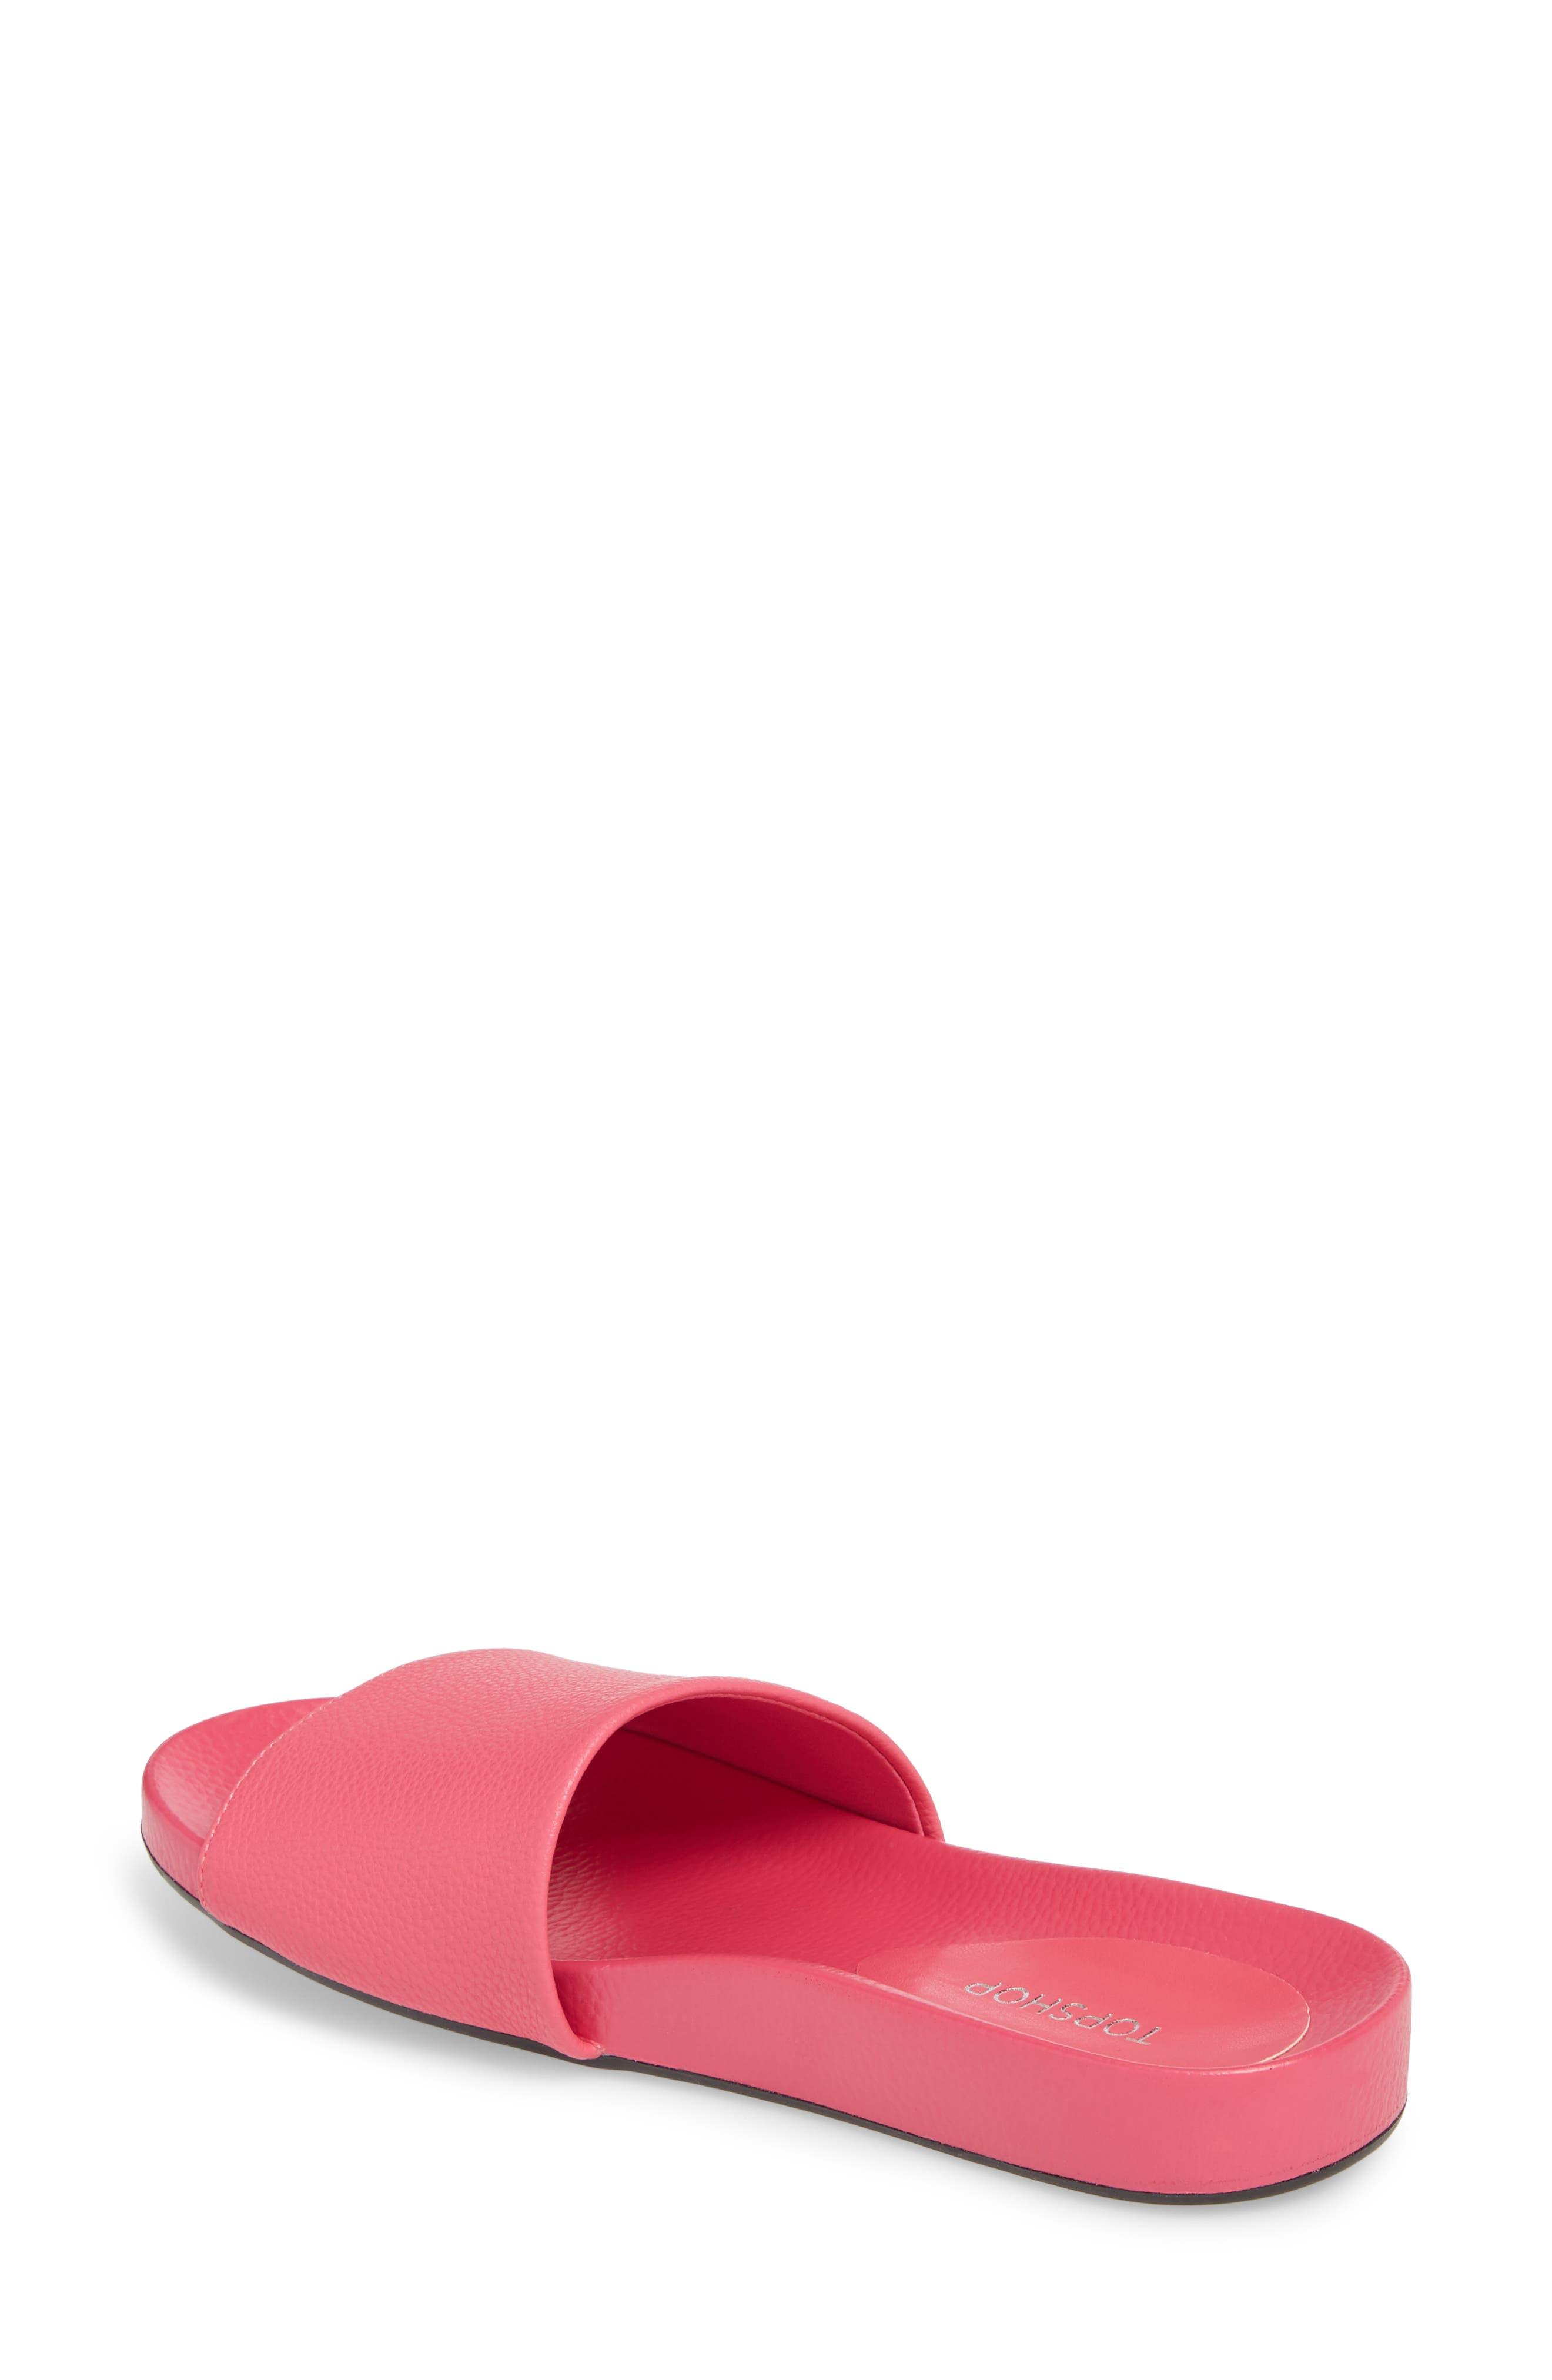 Homie Refined Slide Sandal,                             Alternate thumbnail 2, color,                             PINK